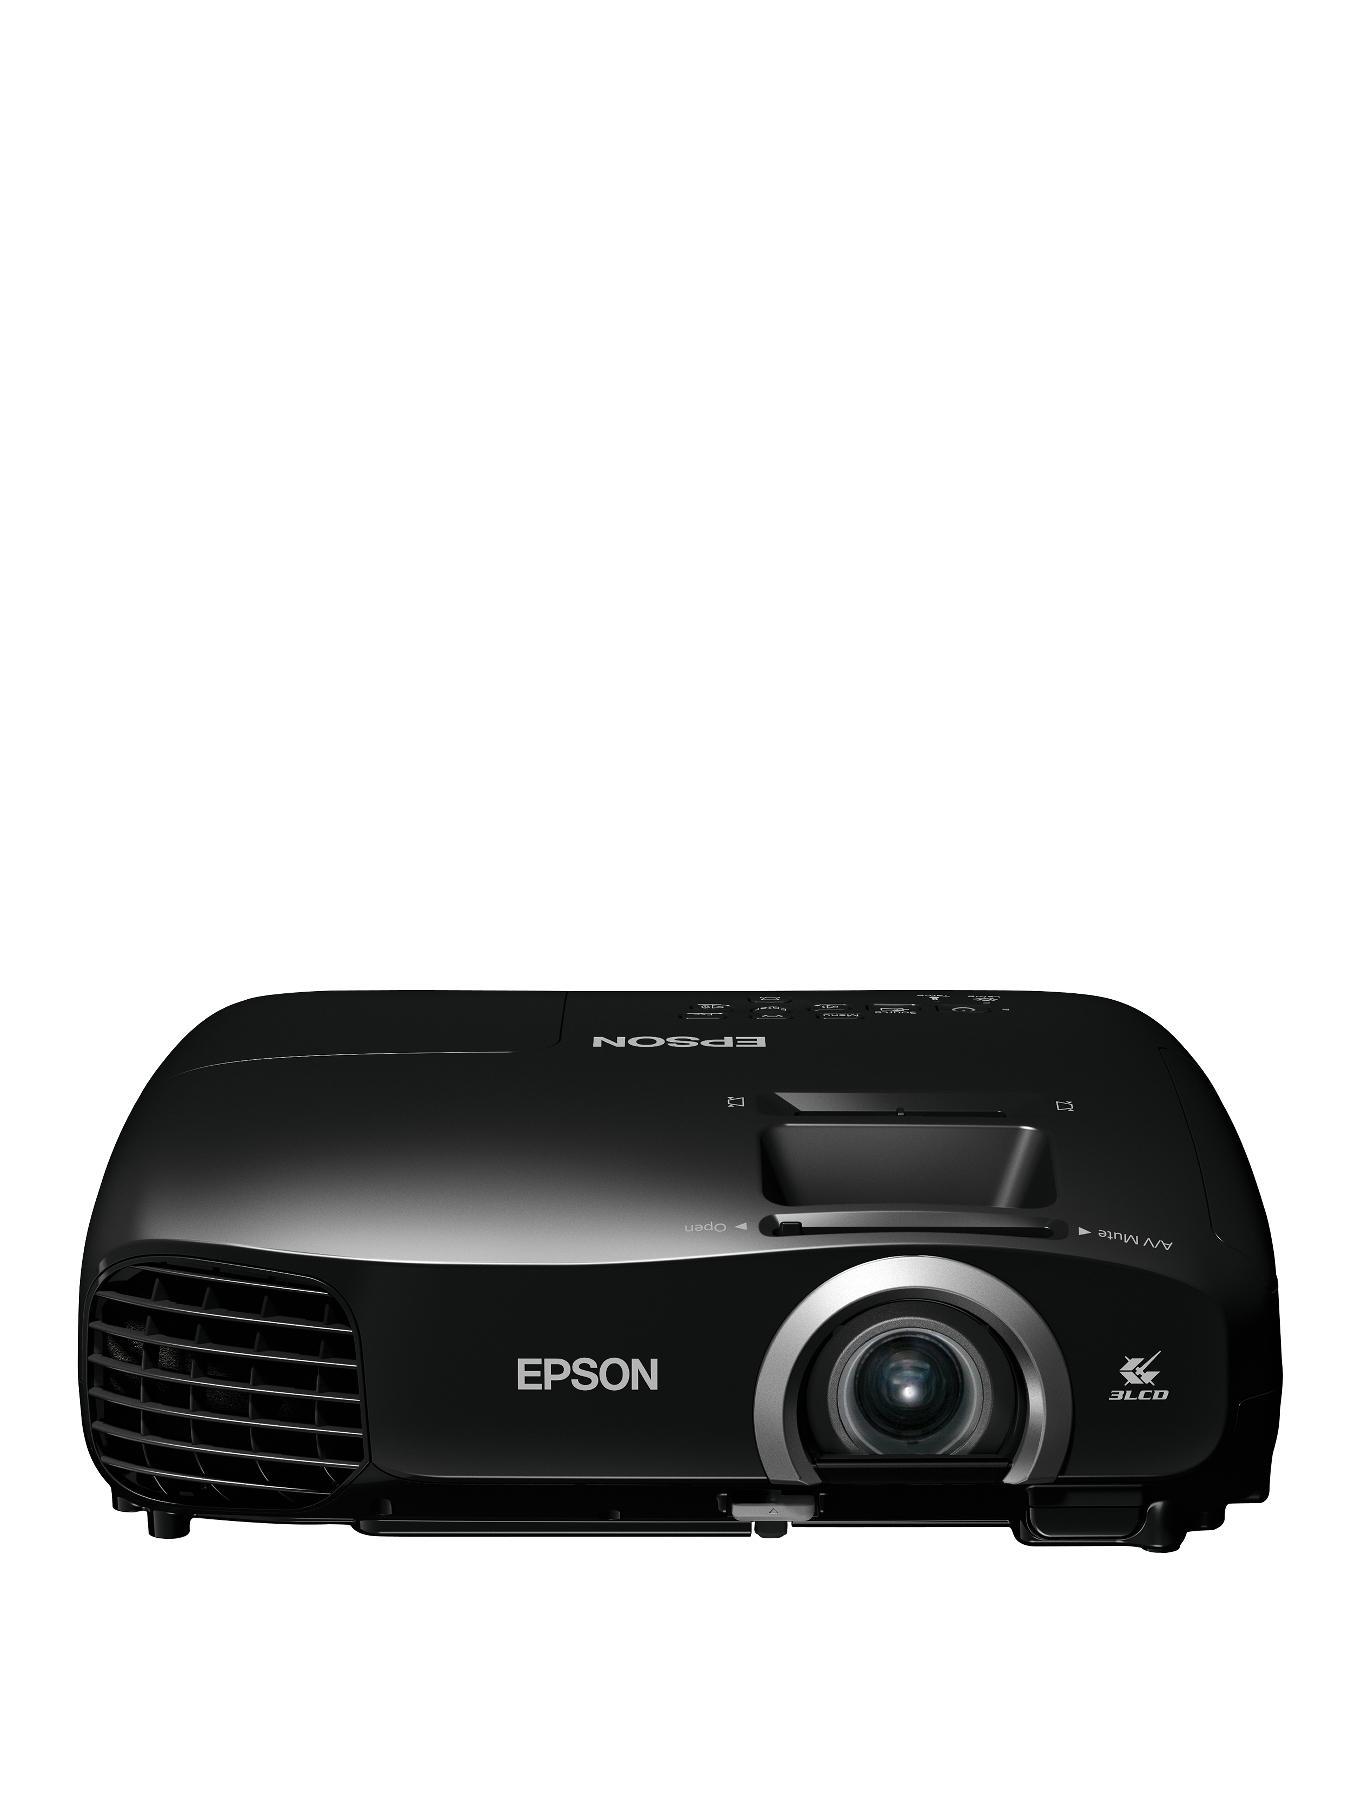 EHTW5200 3D Projector Black